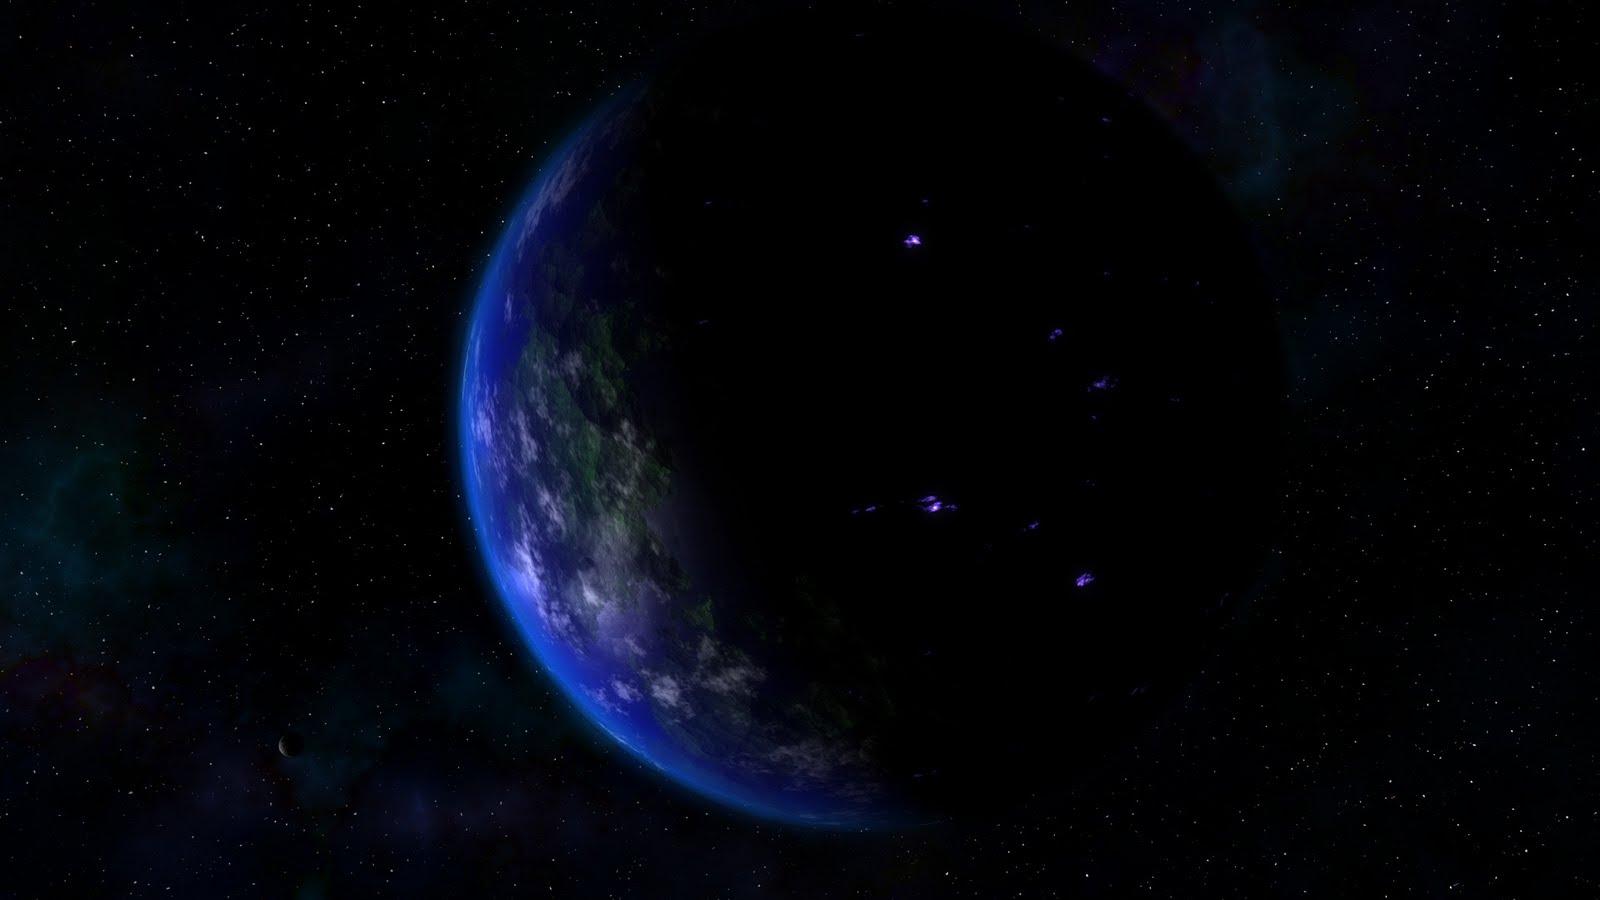 earth wallpaper hd 1080p - photo #26